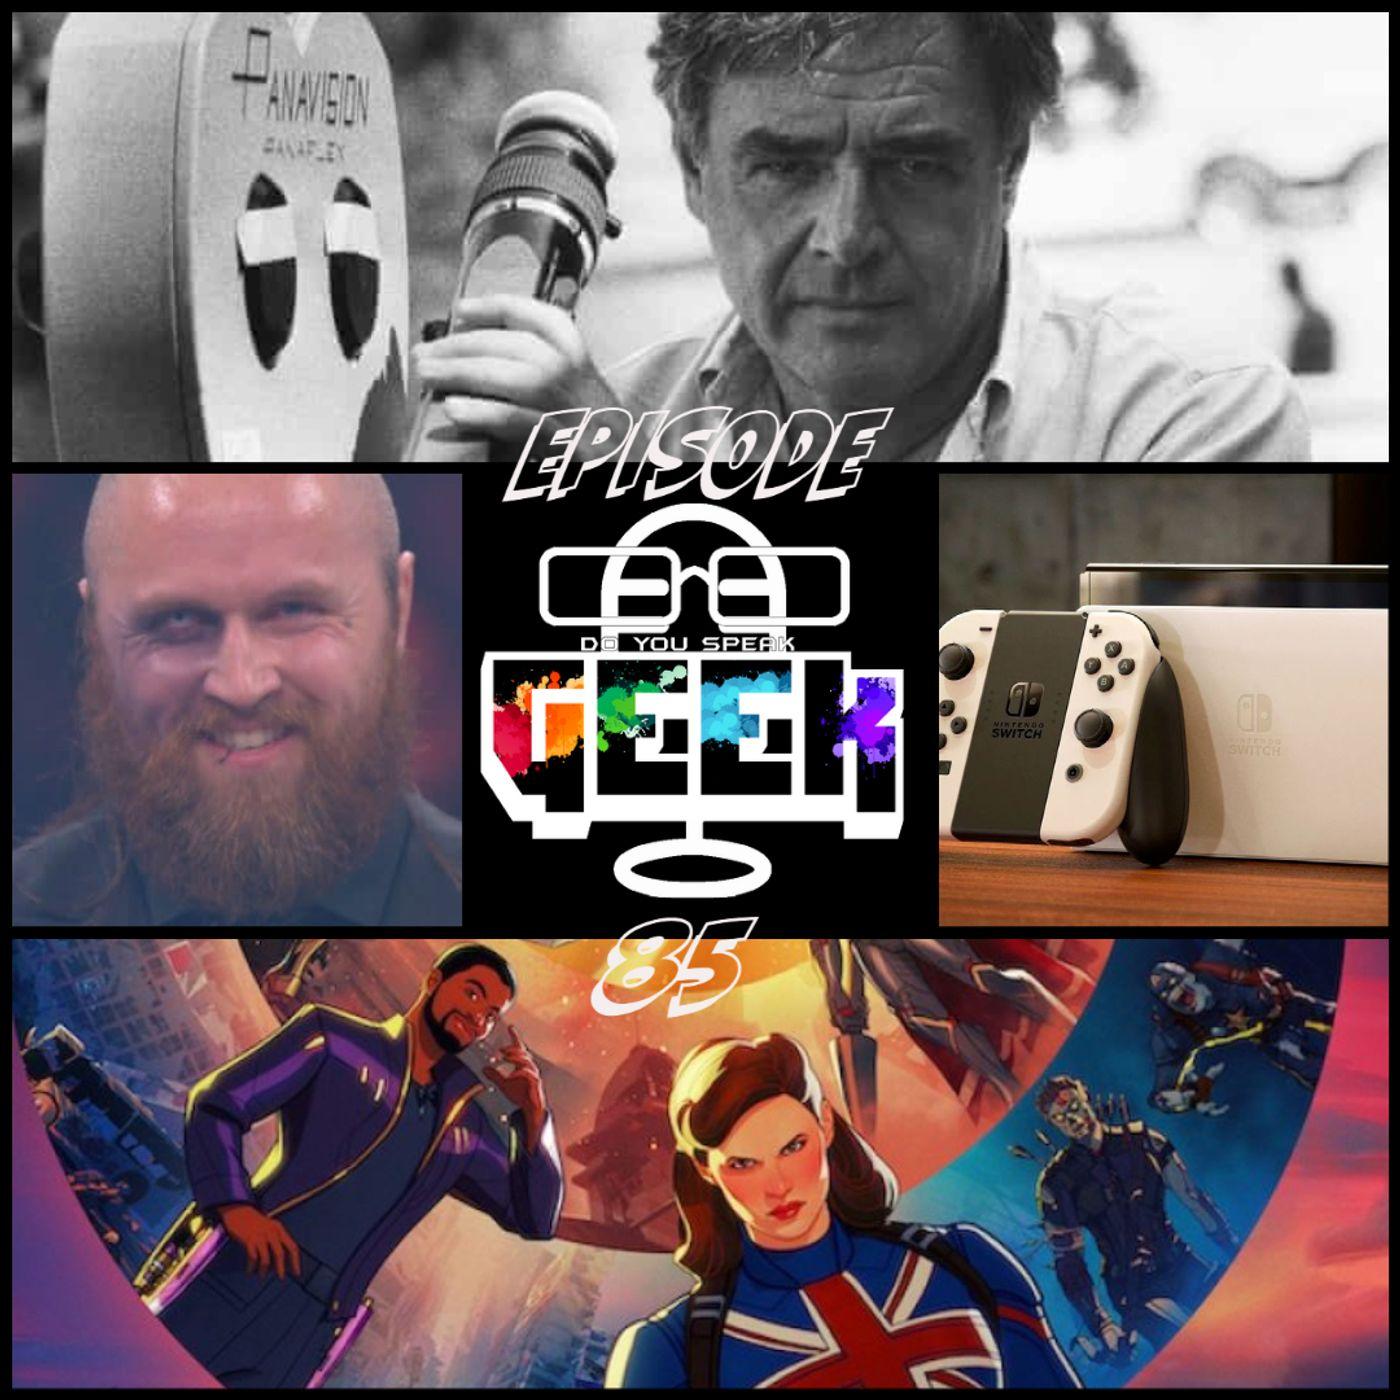 Episode 85 (What If..., Misha Green, Malakai Black, Nintendo Switch, and more)